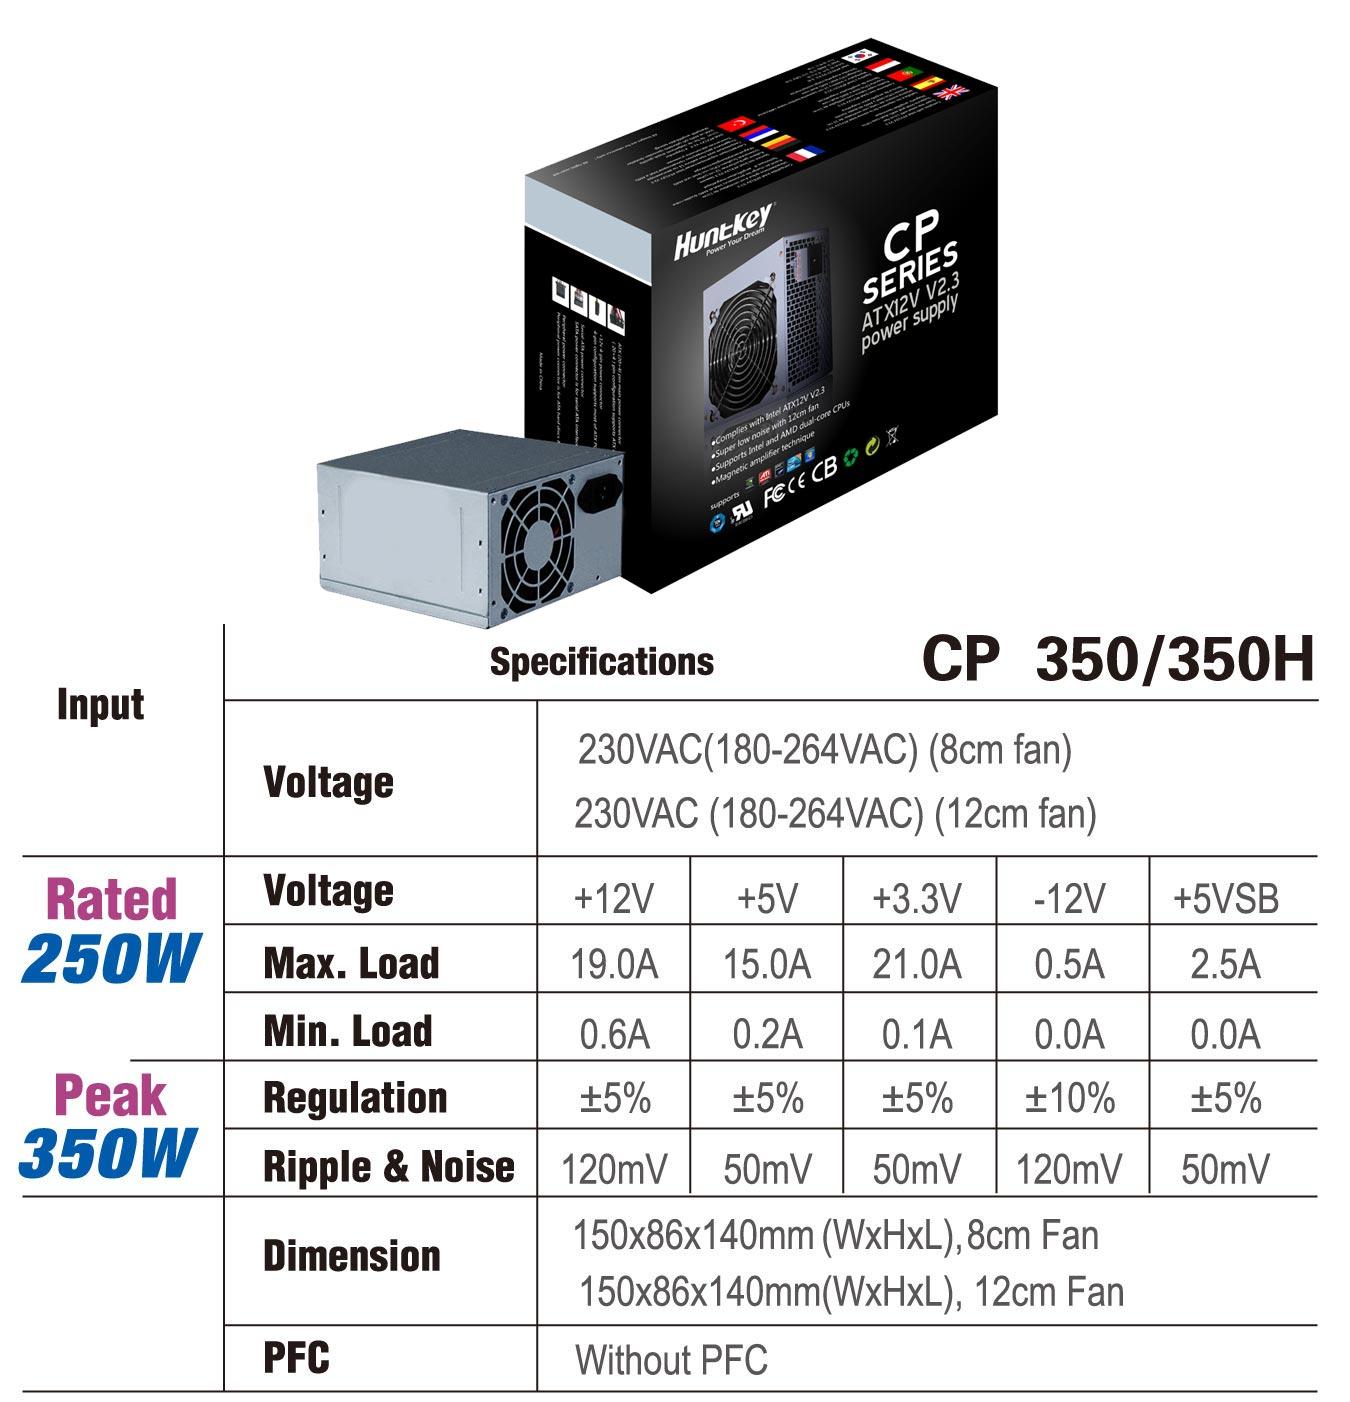 11-44 CP 350/350H